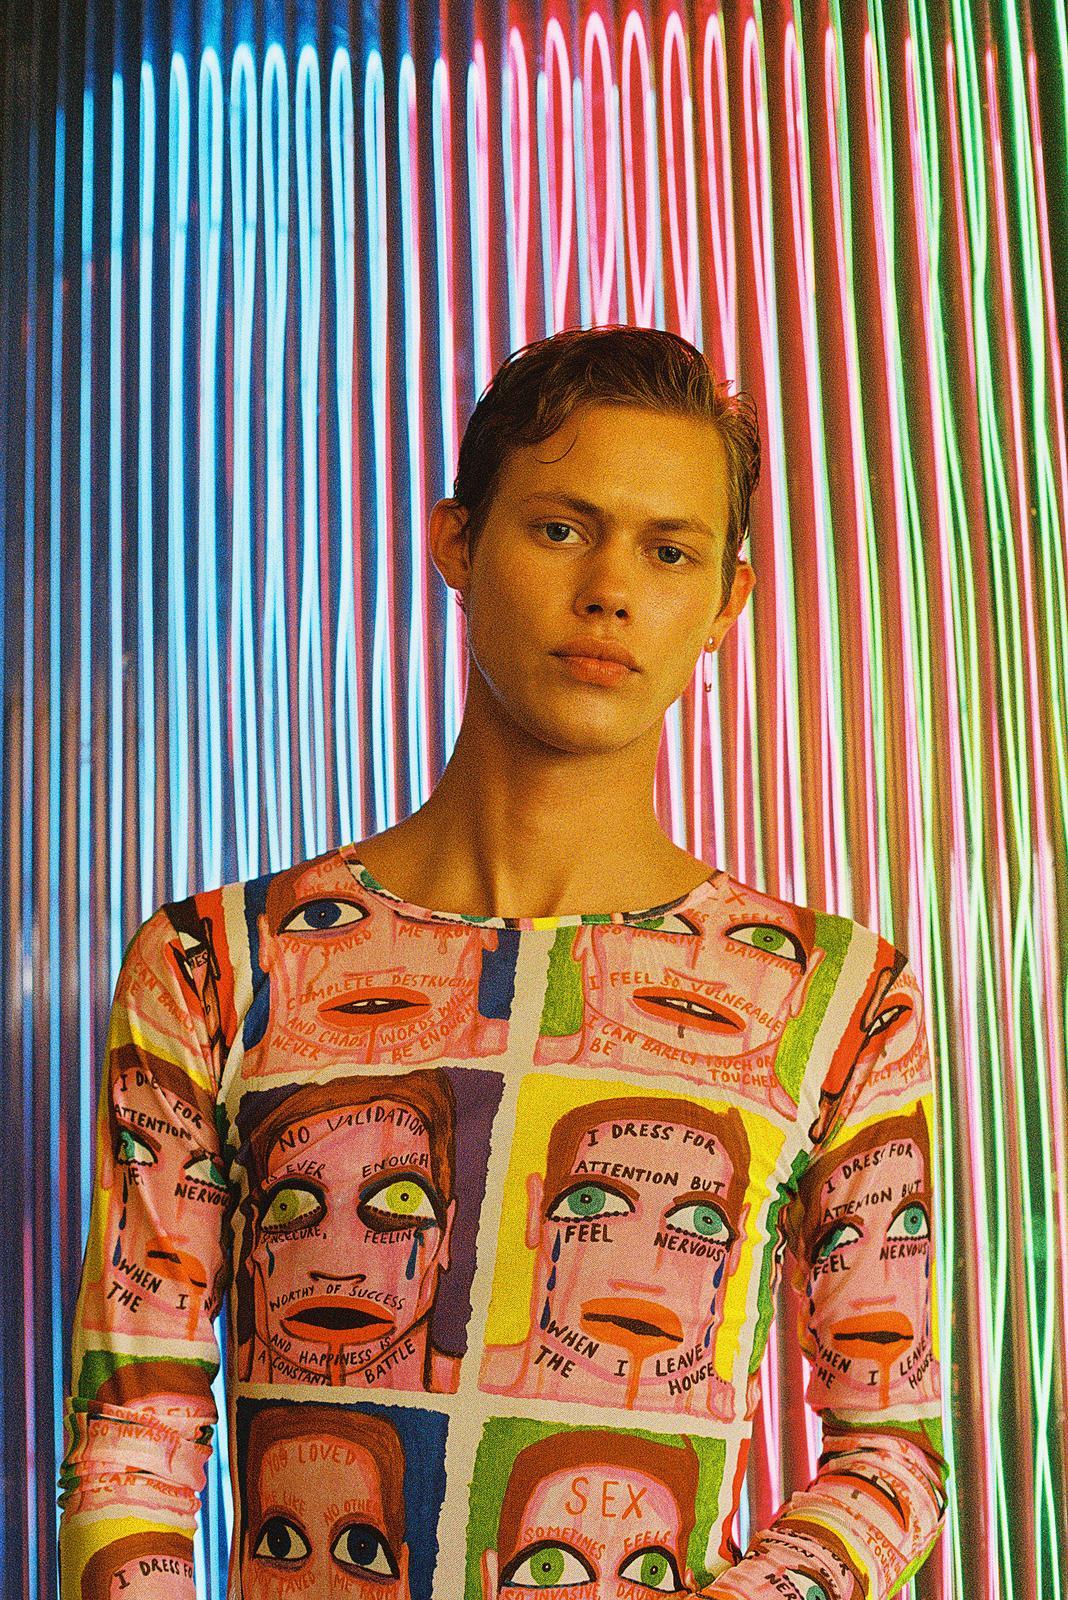 Patrick Church fashion design